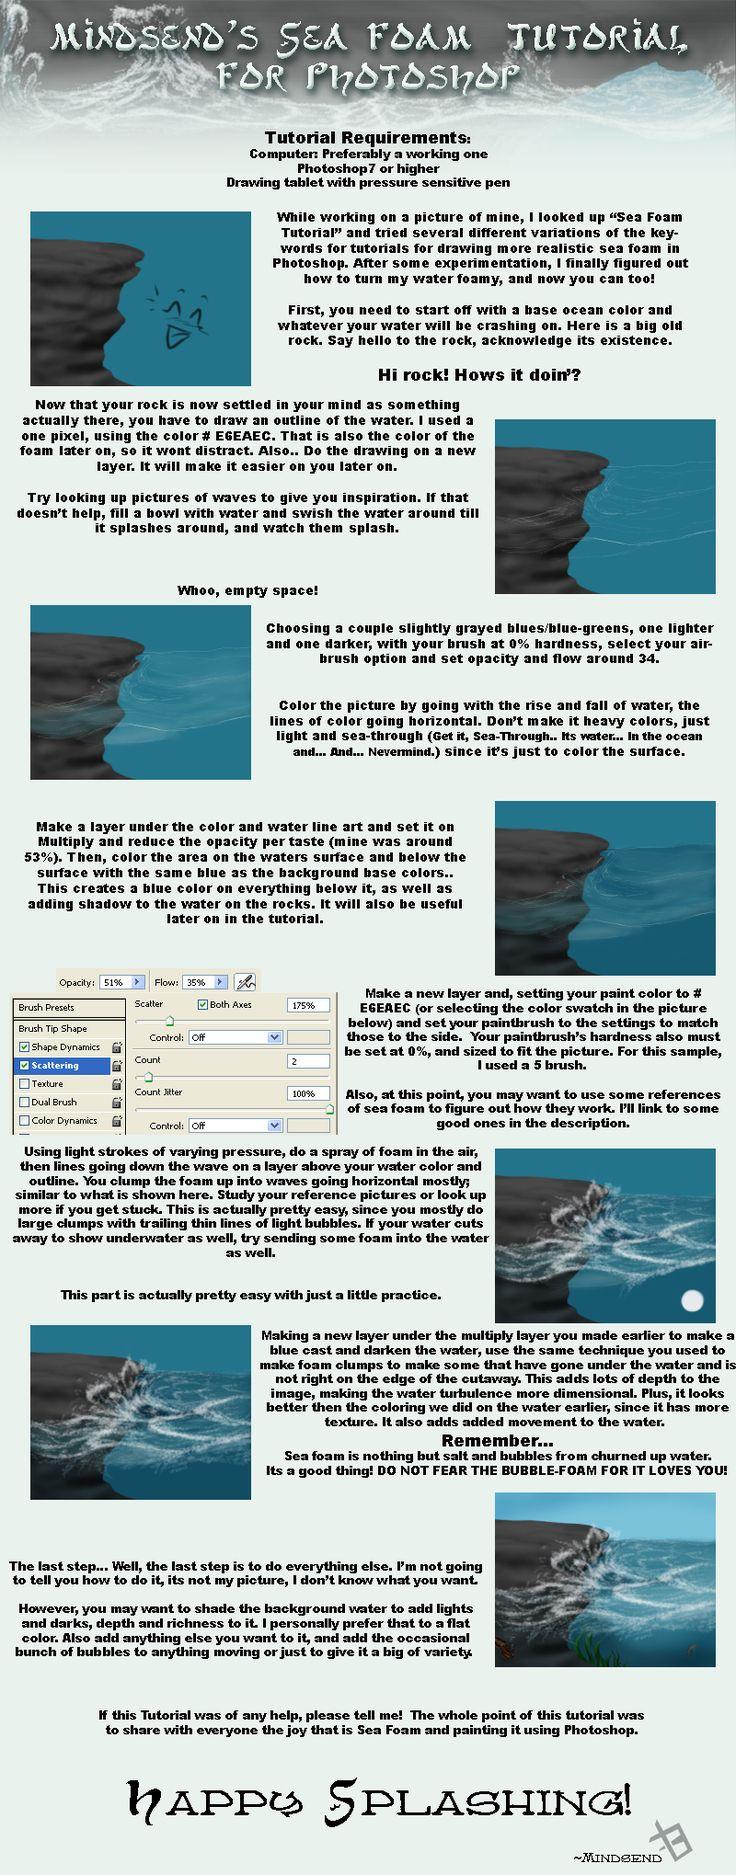 SeaFoam Tutorial for Photoshop by mindsend.deviantart.com